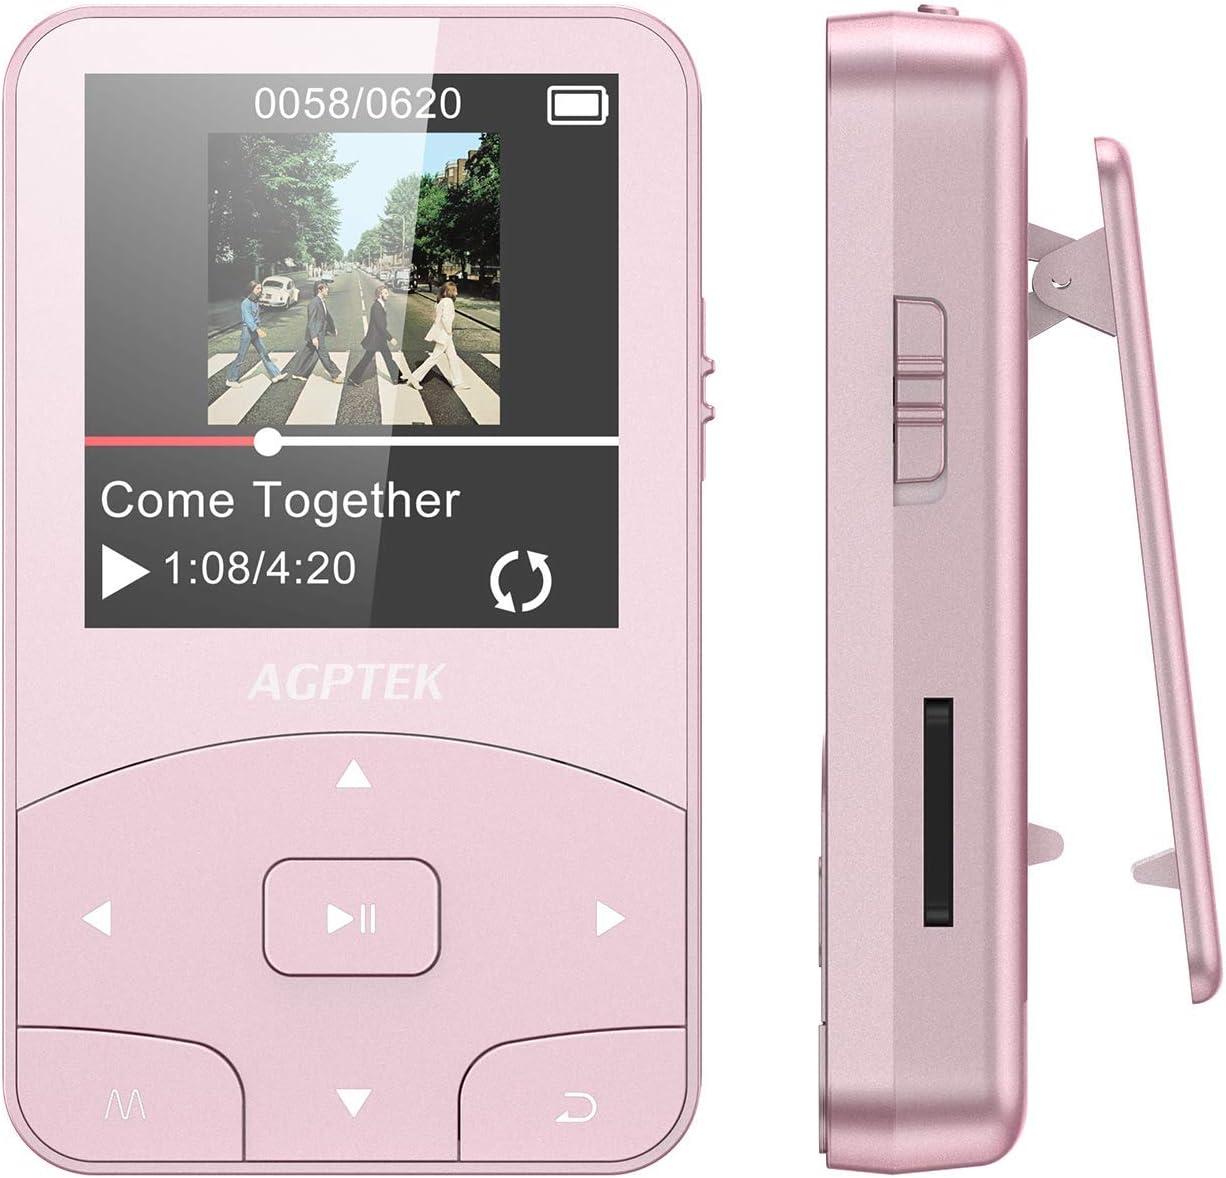 AGPTEK Reproductor MP3 Bluetooth Running, A58 HiFi Reproductor de Música 8GB con Podómetro, Radio FM, Grabación de Voz, E-Book, Soporta TF hasta 128GB, Rosa